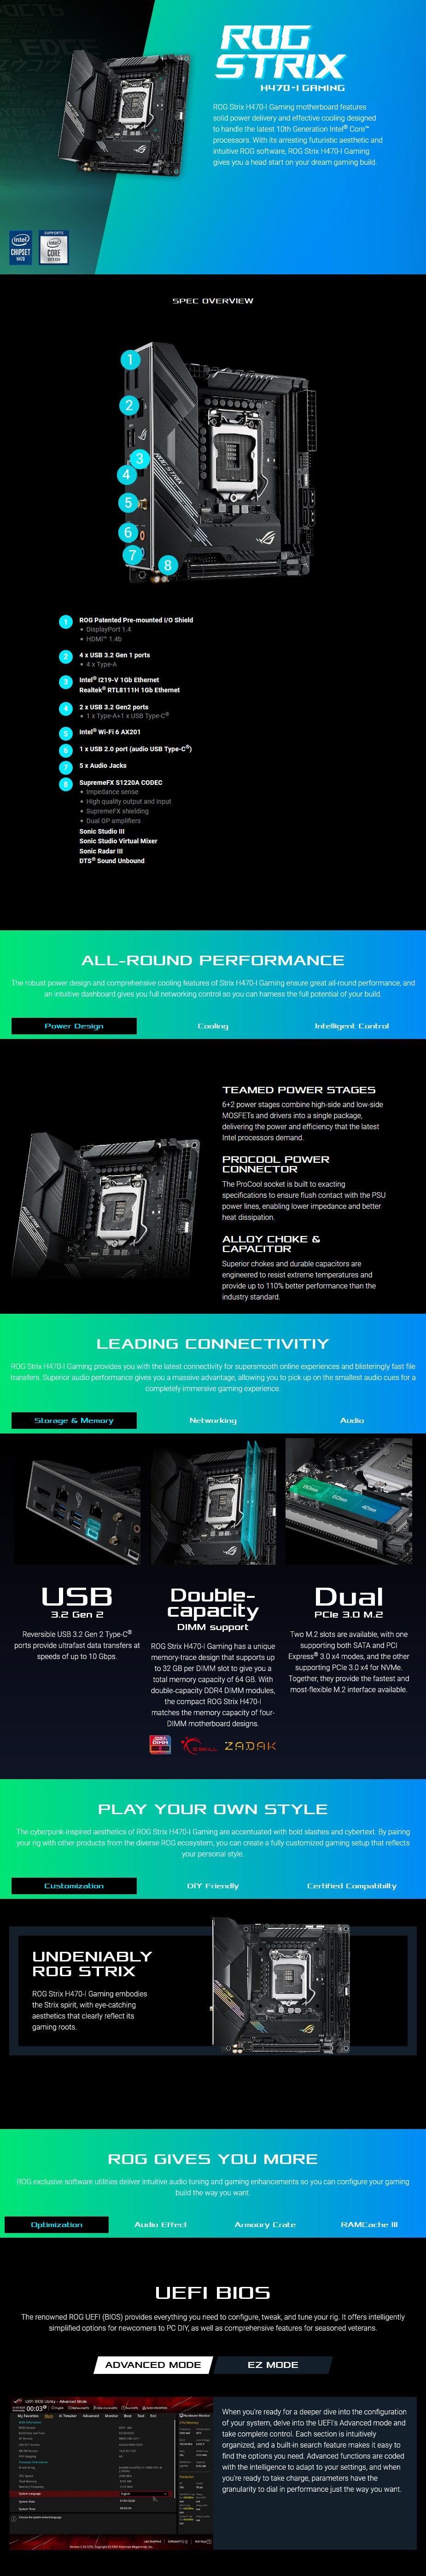 asus-rog-strix-h470i-gaming-lga-1200-miniitx-motherboard-ac35247-12.jpg